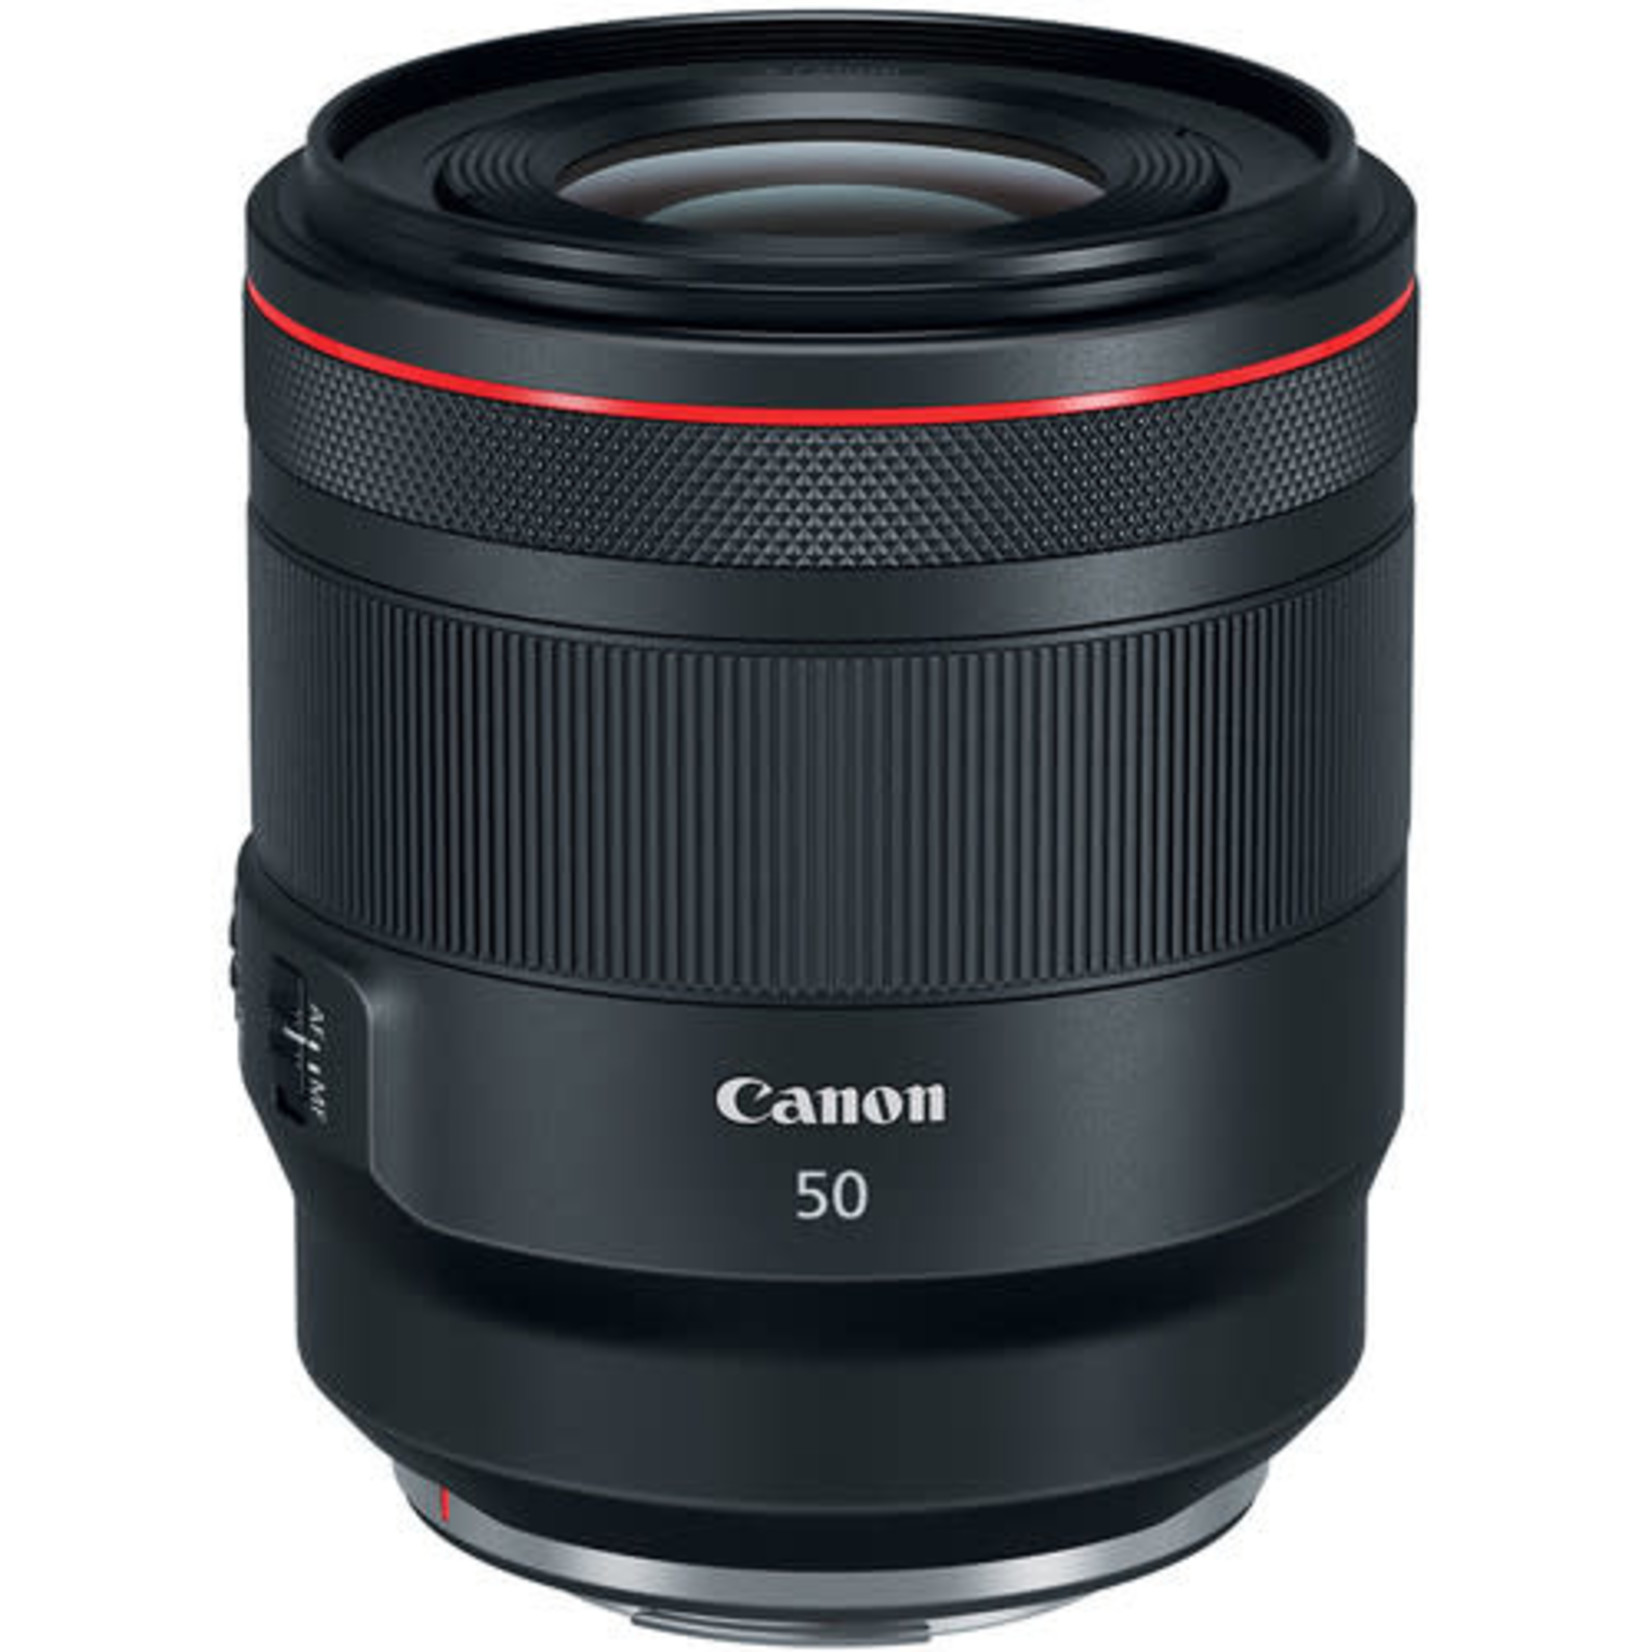 Canon Canon RF 50mm f/1.2L USM Lens